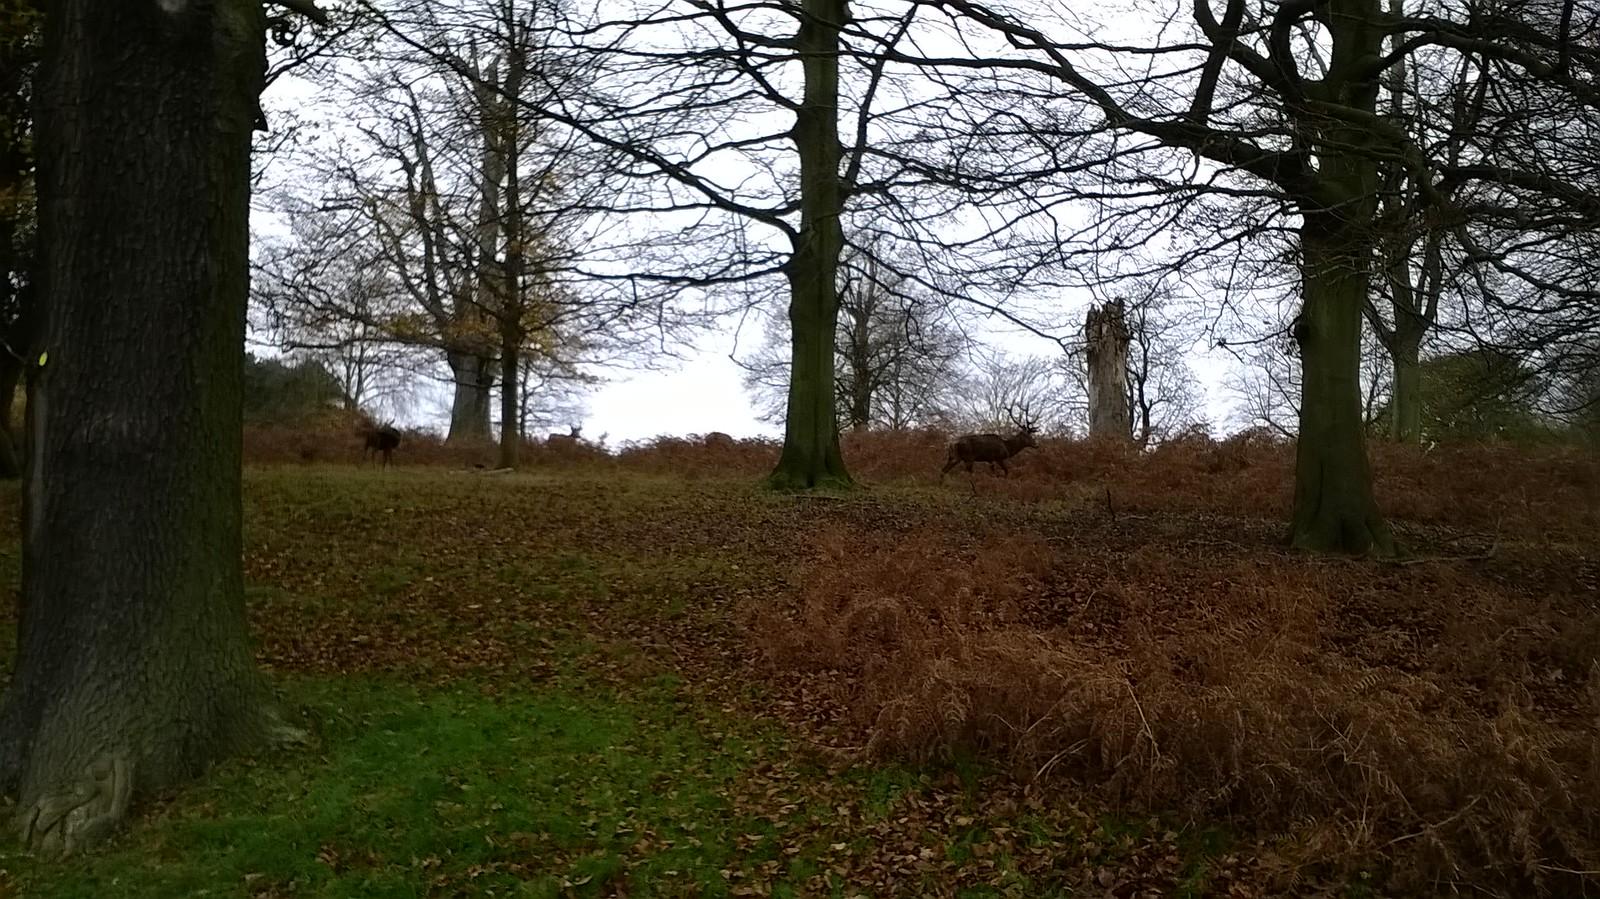 Deer among the trees Richmond Park